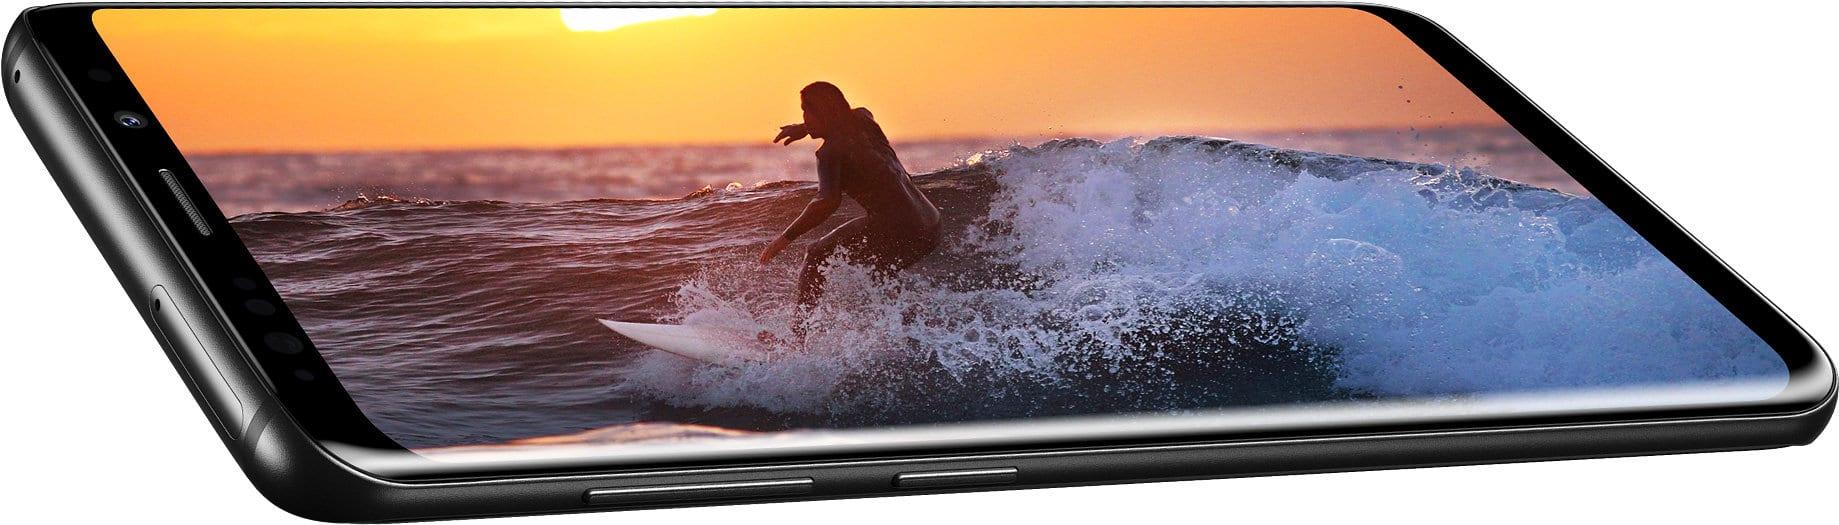 S9 Display